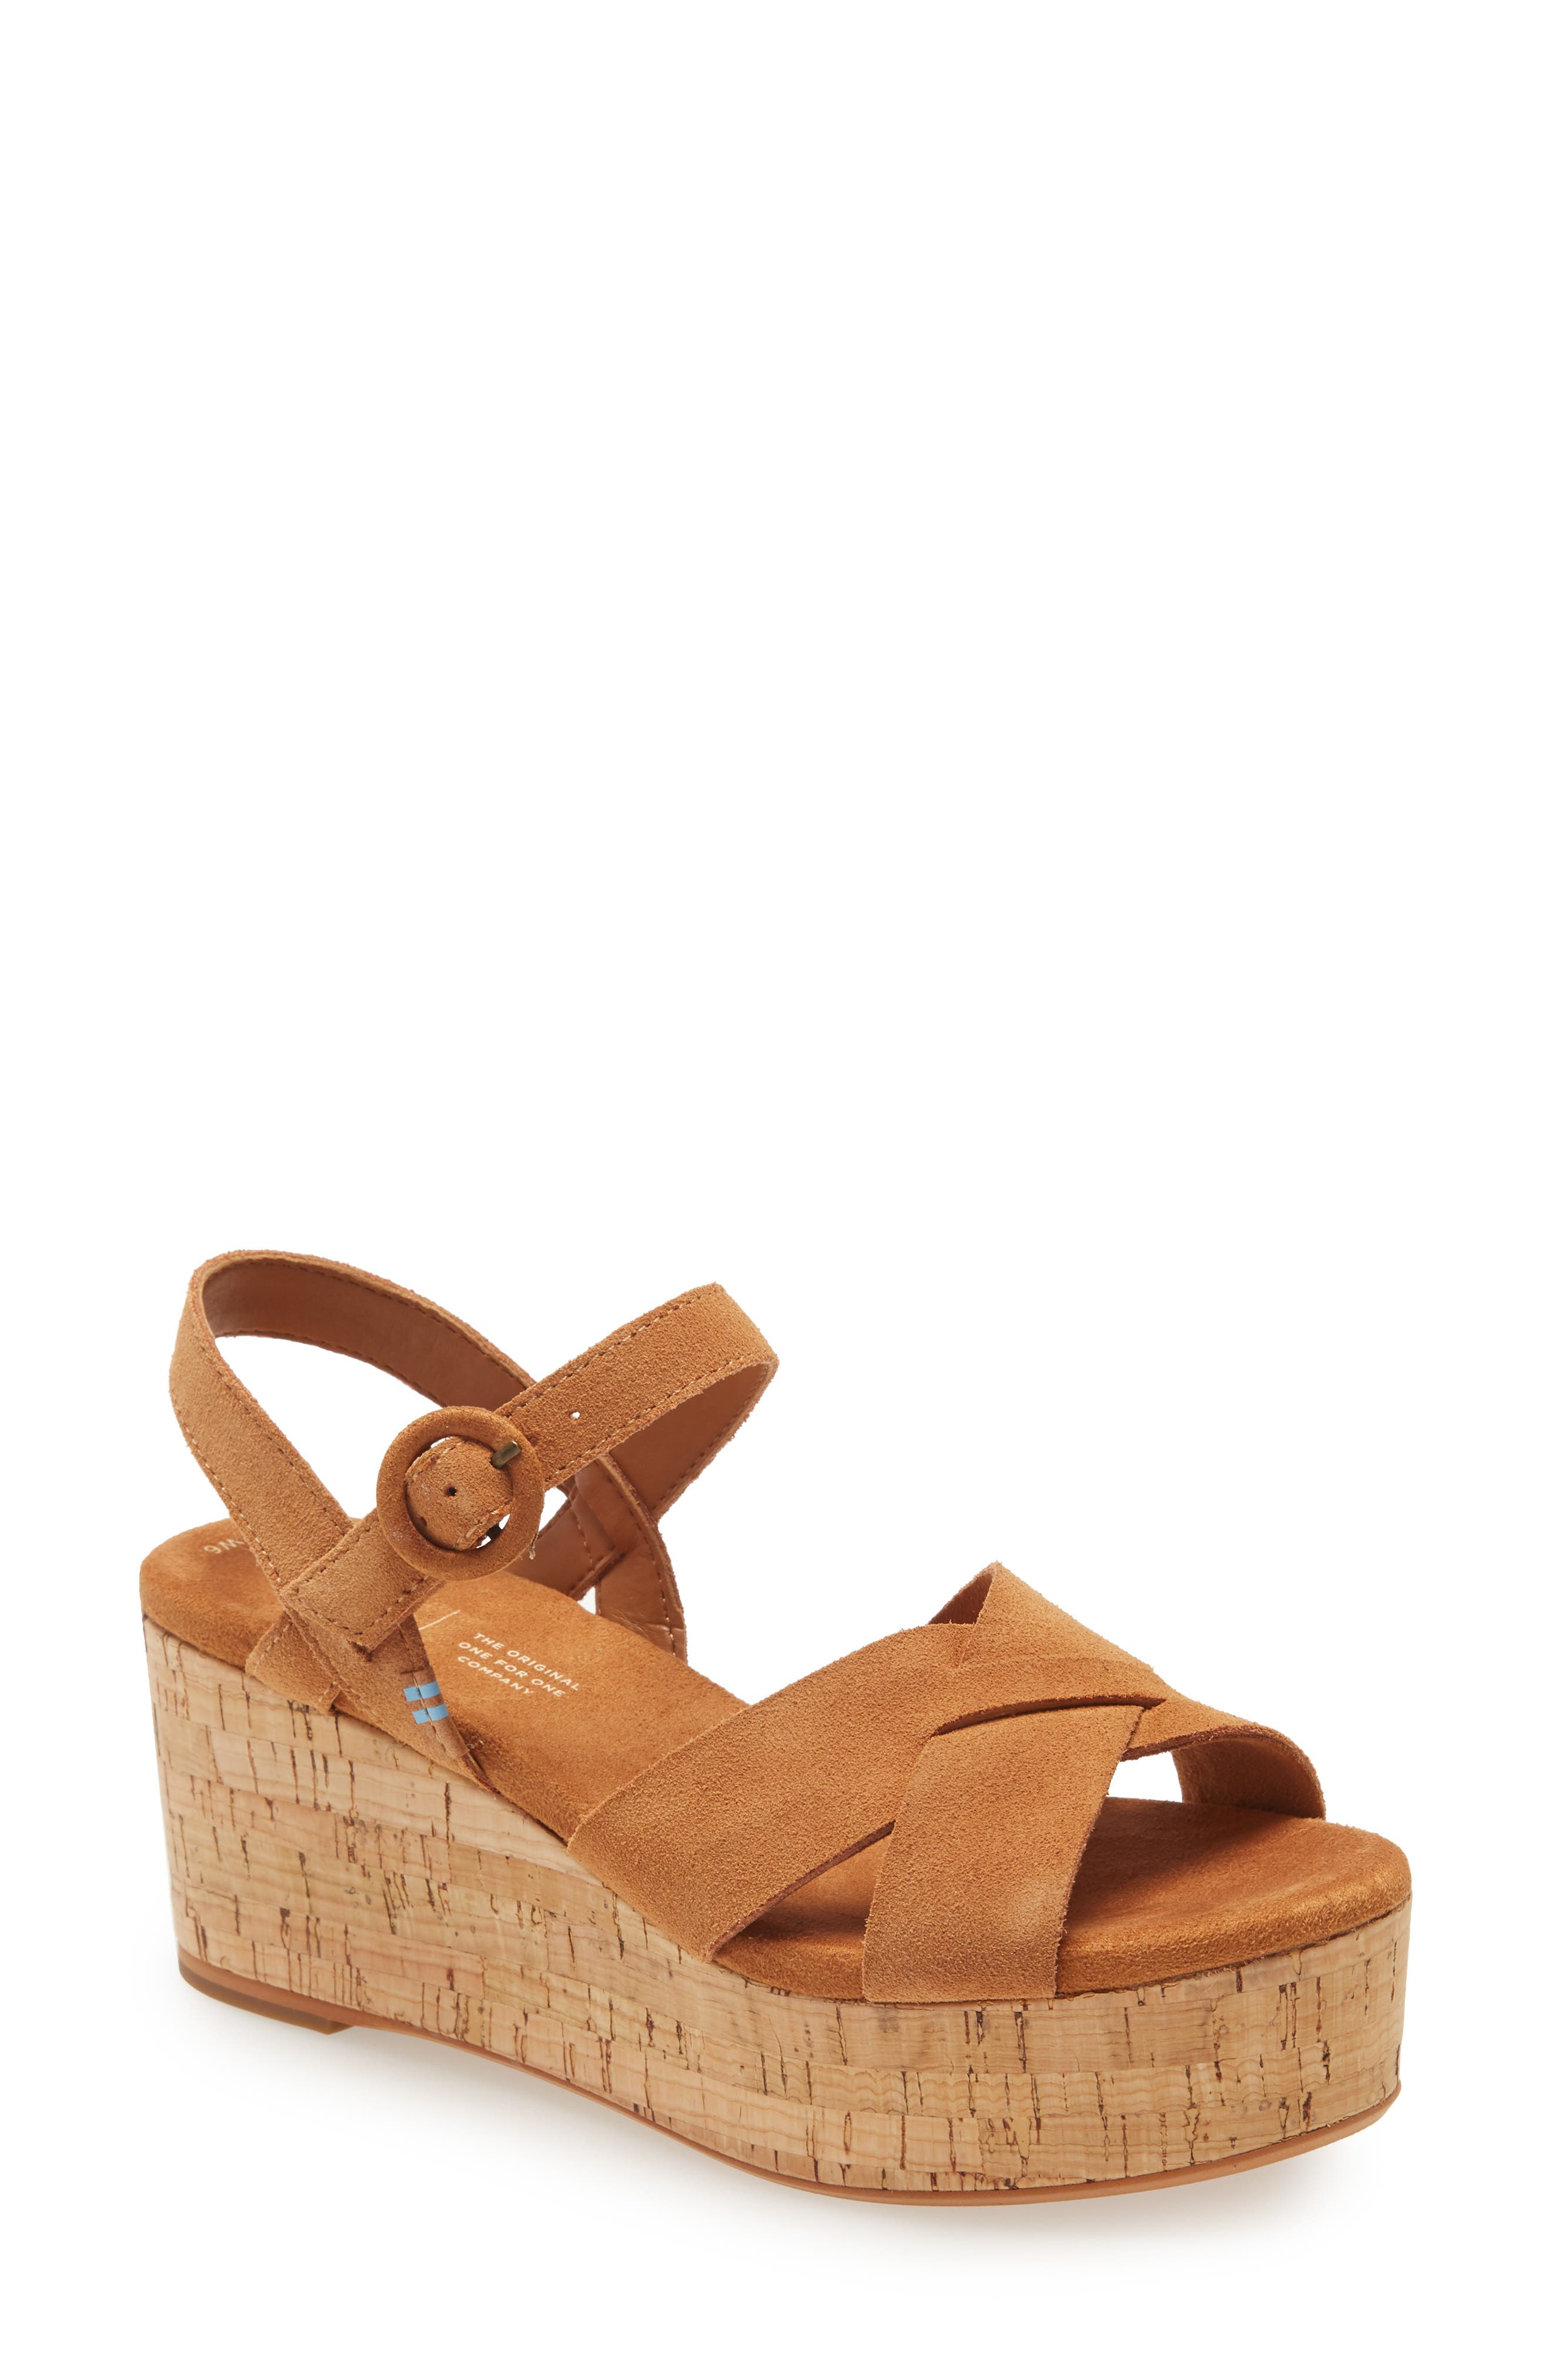 Women's TOMS Shoes Sale \u0026 Clearance